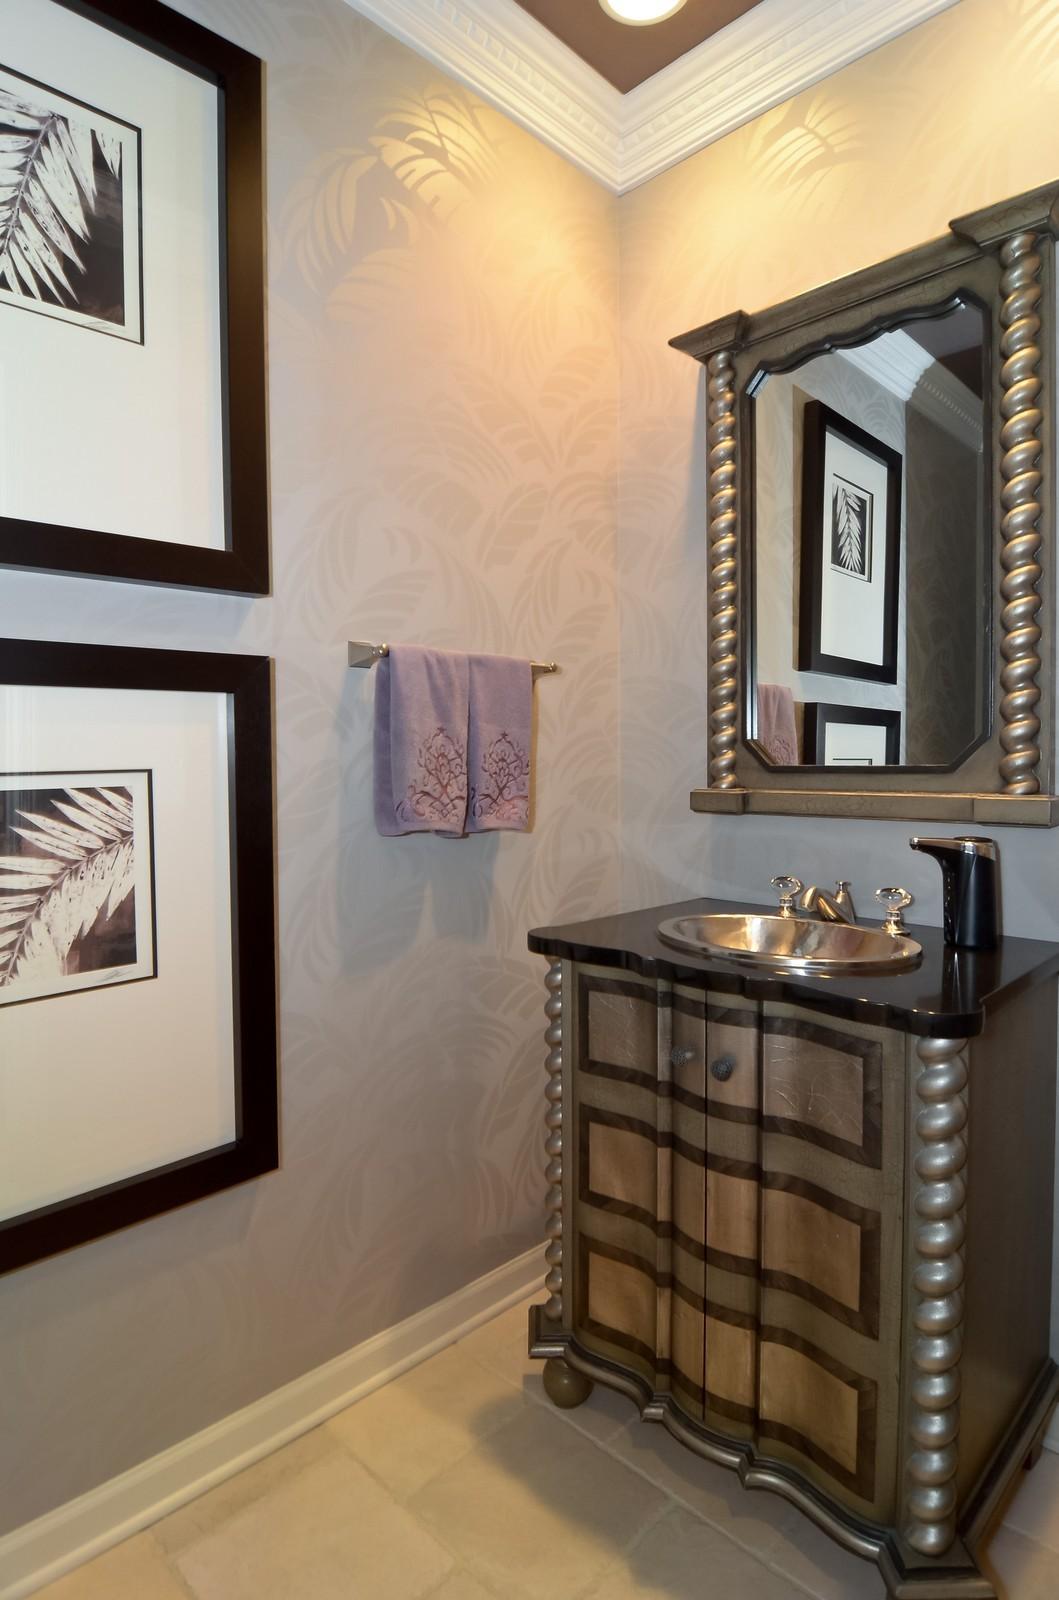 Real Estate Photography - 530 N Lake Shore Drive, Unit 2800, Chicago, IL, 60611 - Half Bath